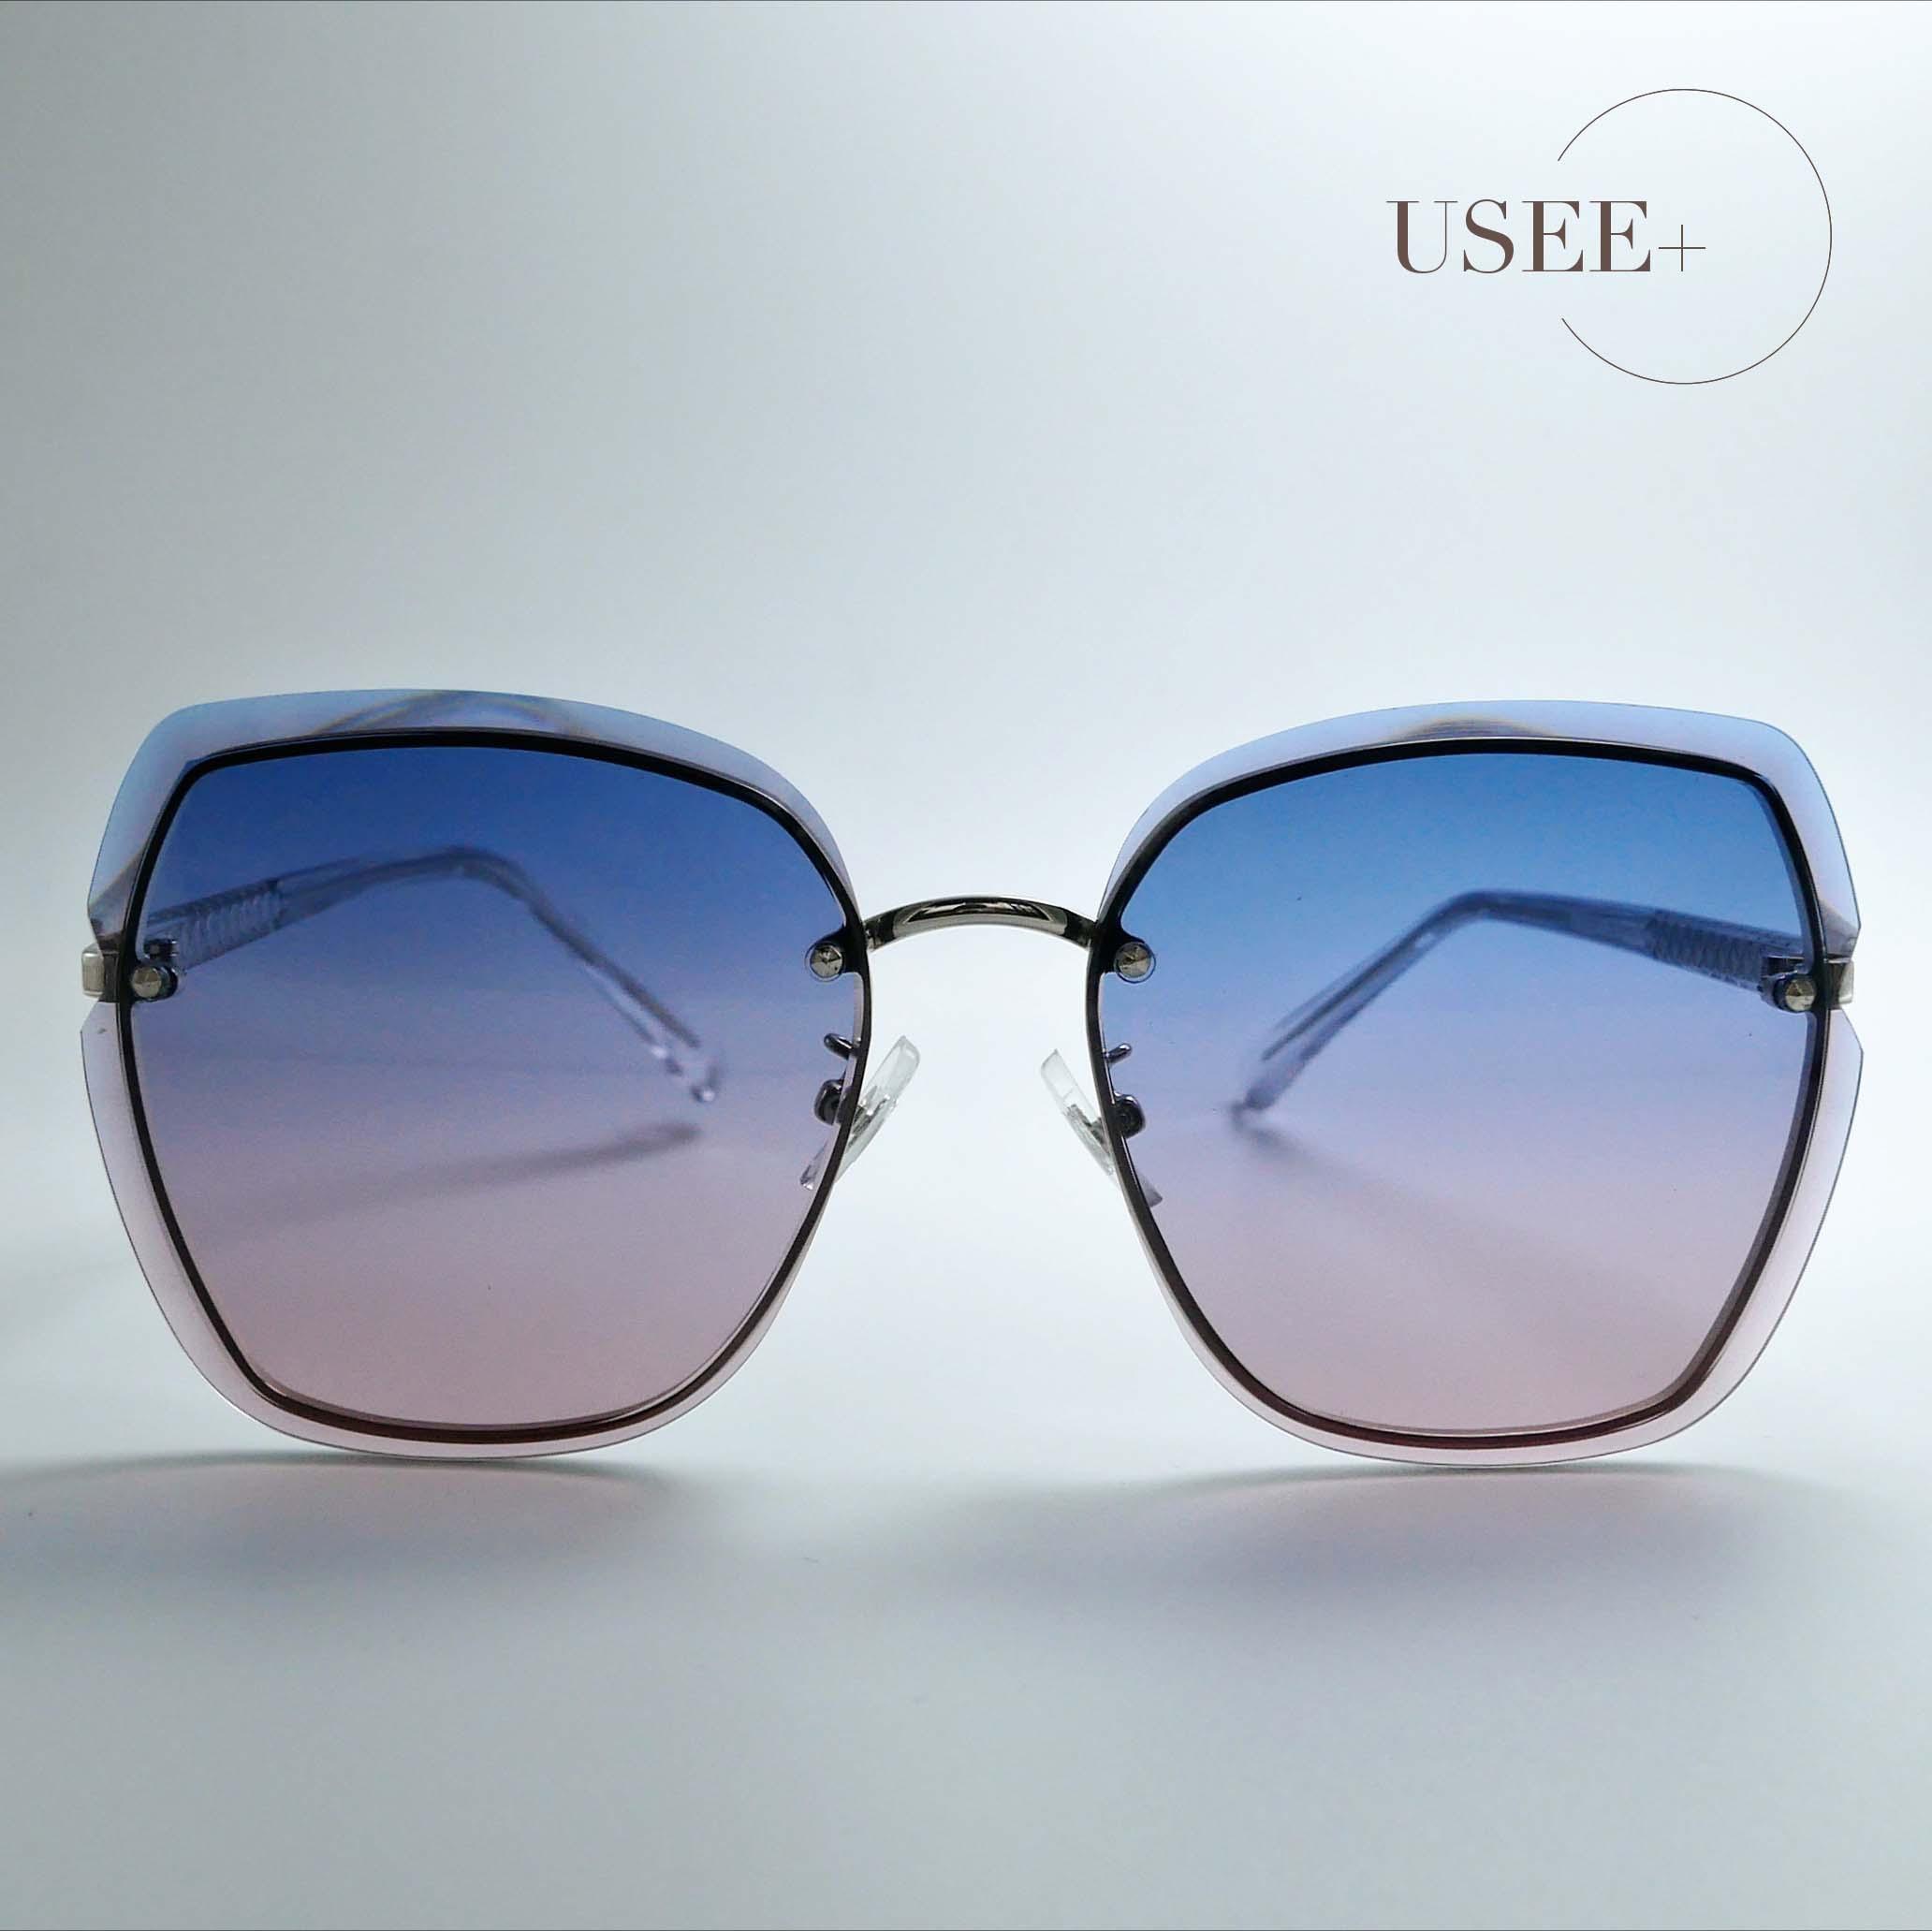 USEE+ 有晰眼镜百搭帅气时尚墨镜